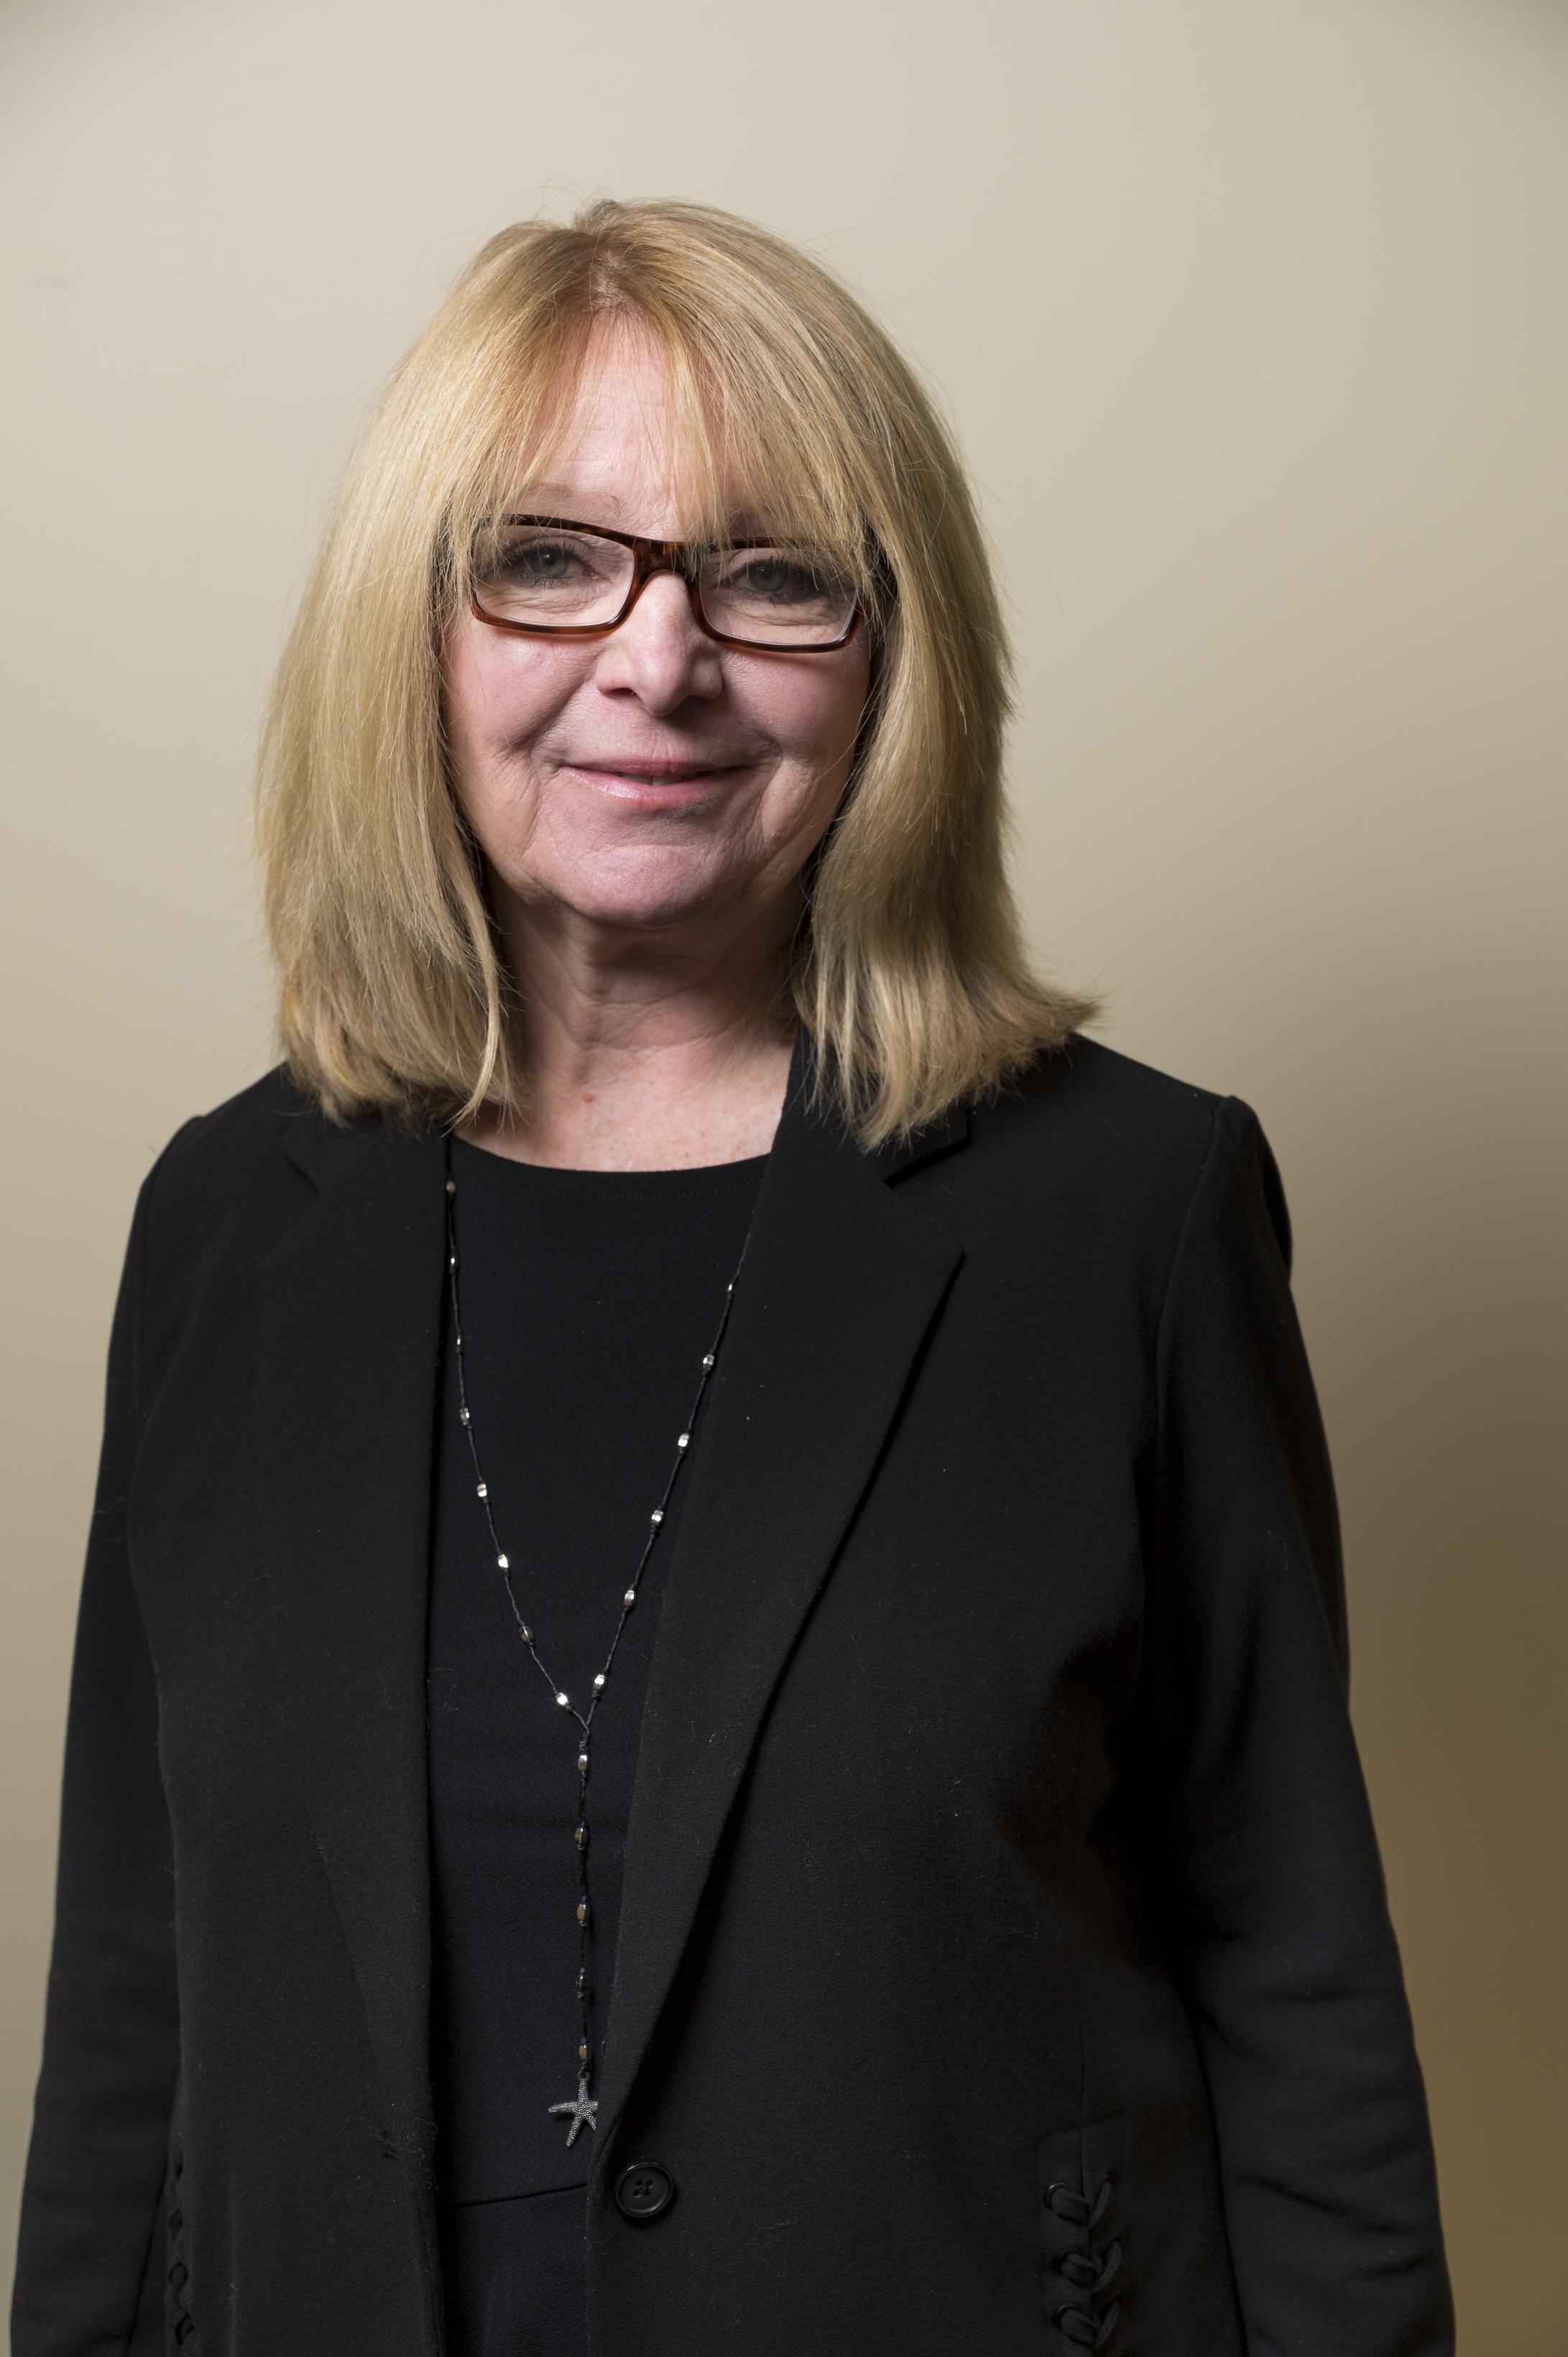 Charlene F. Pontbriand